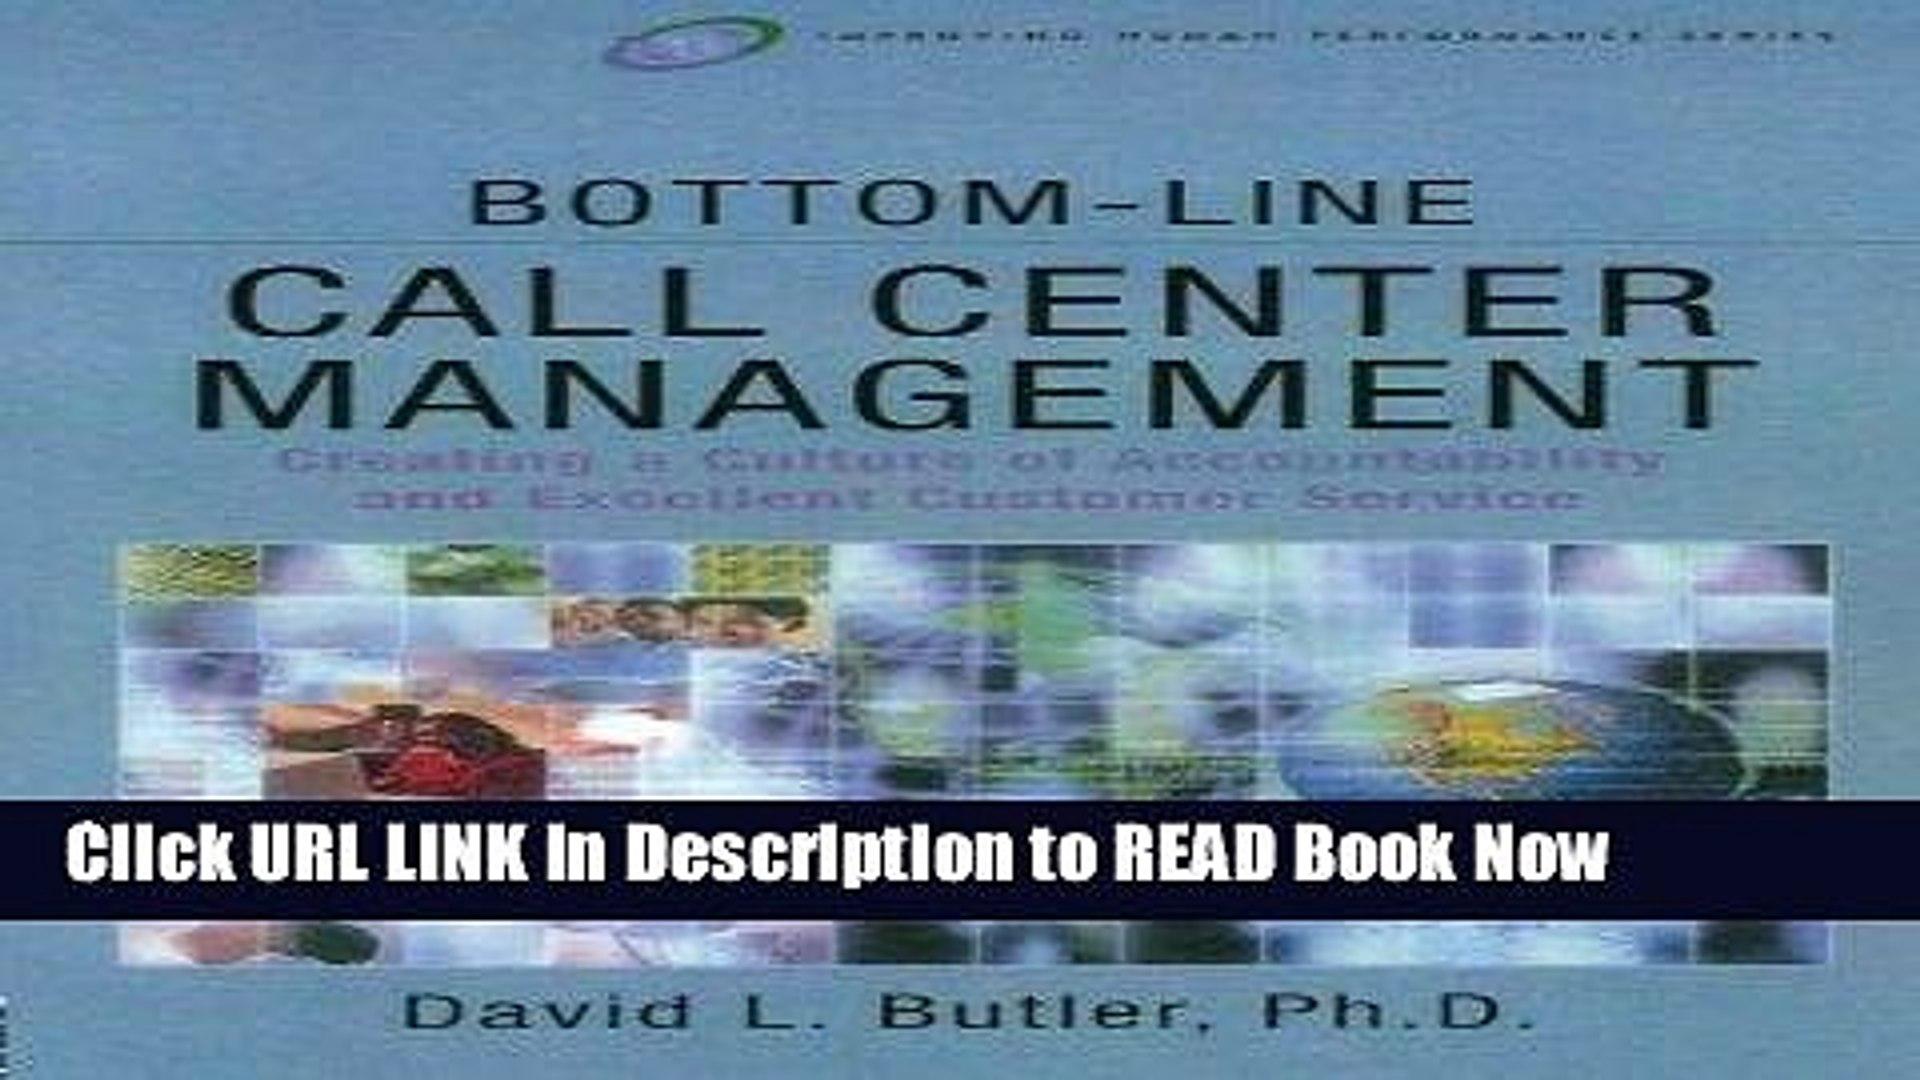 [Popular Books] Bottom-Line Call Center Management (Improving Human Performance) FULL eBook